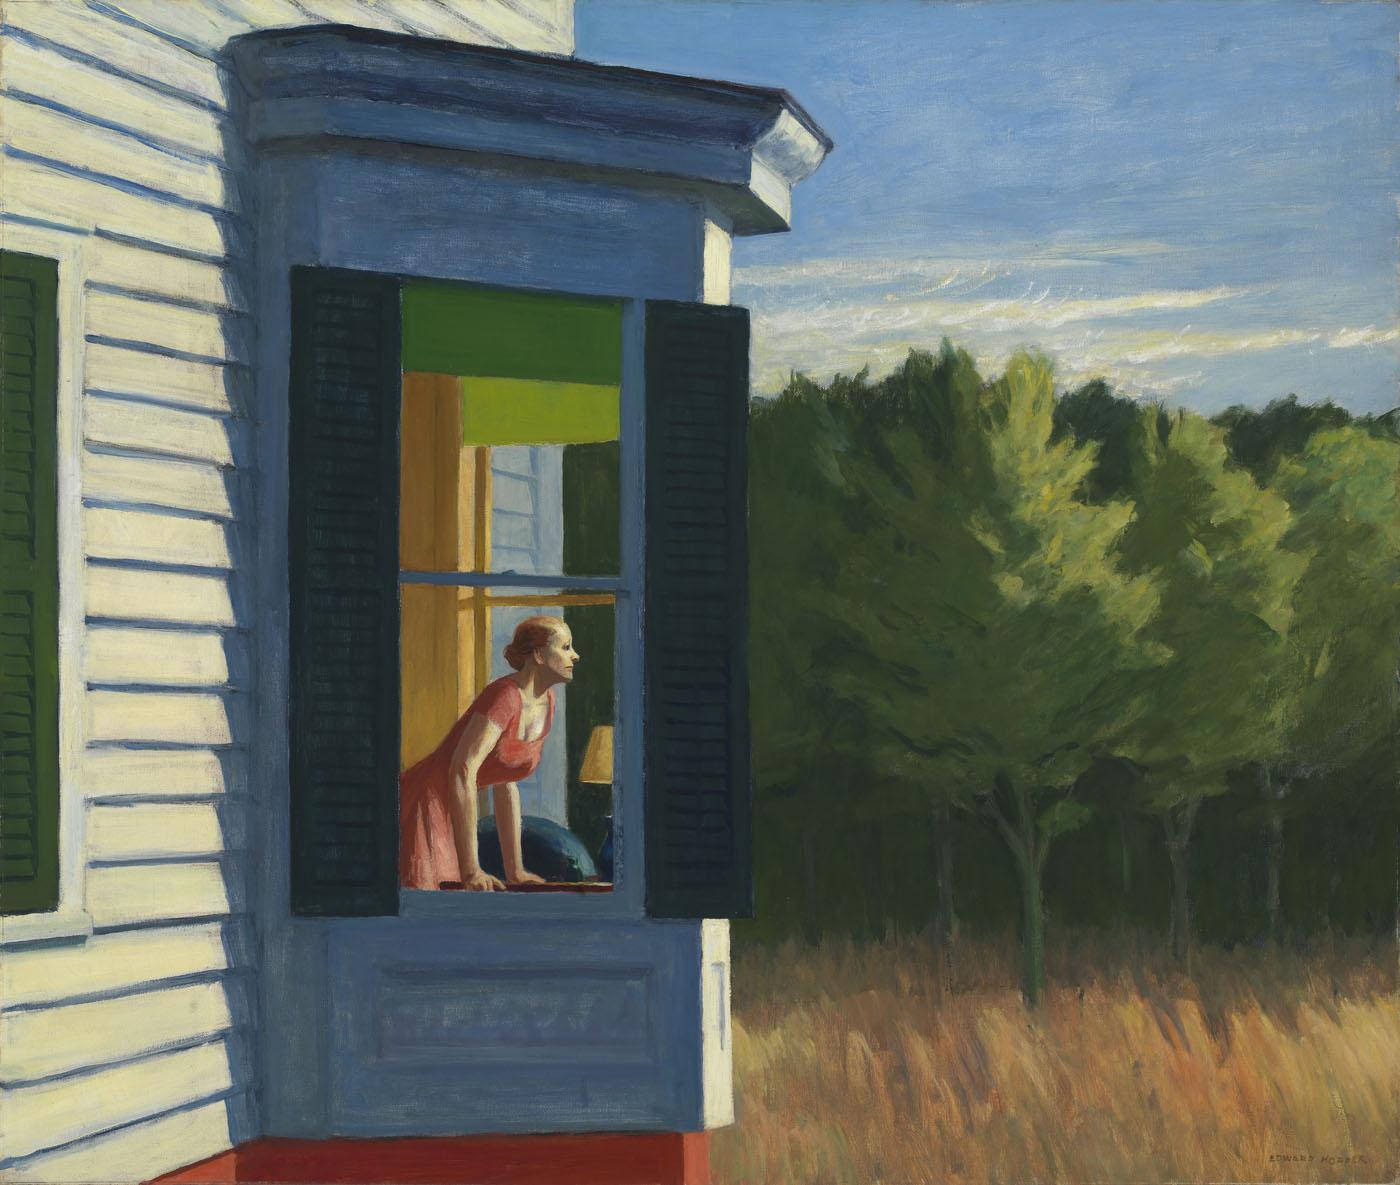 Edward Hopper, Cape Cod Morning , 1950